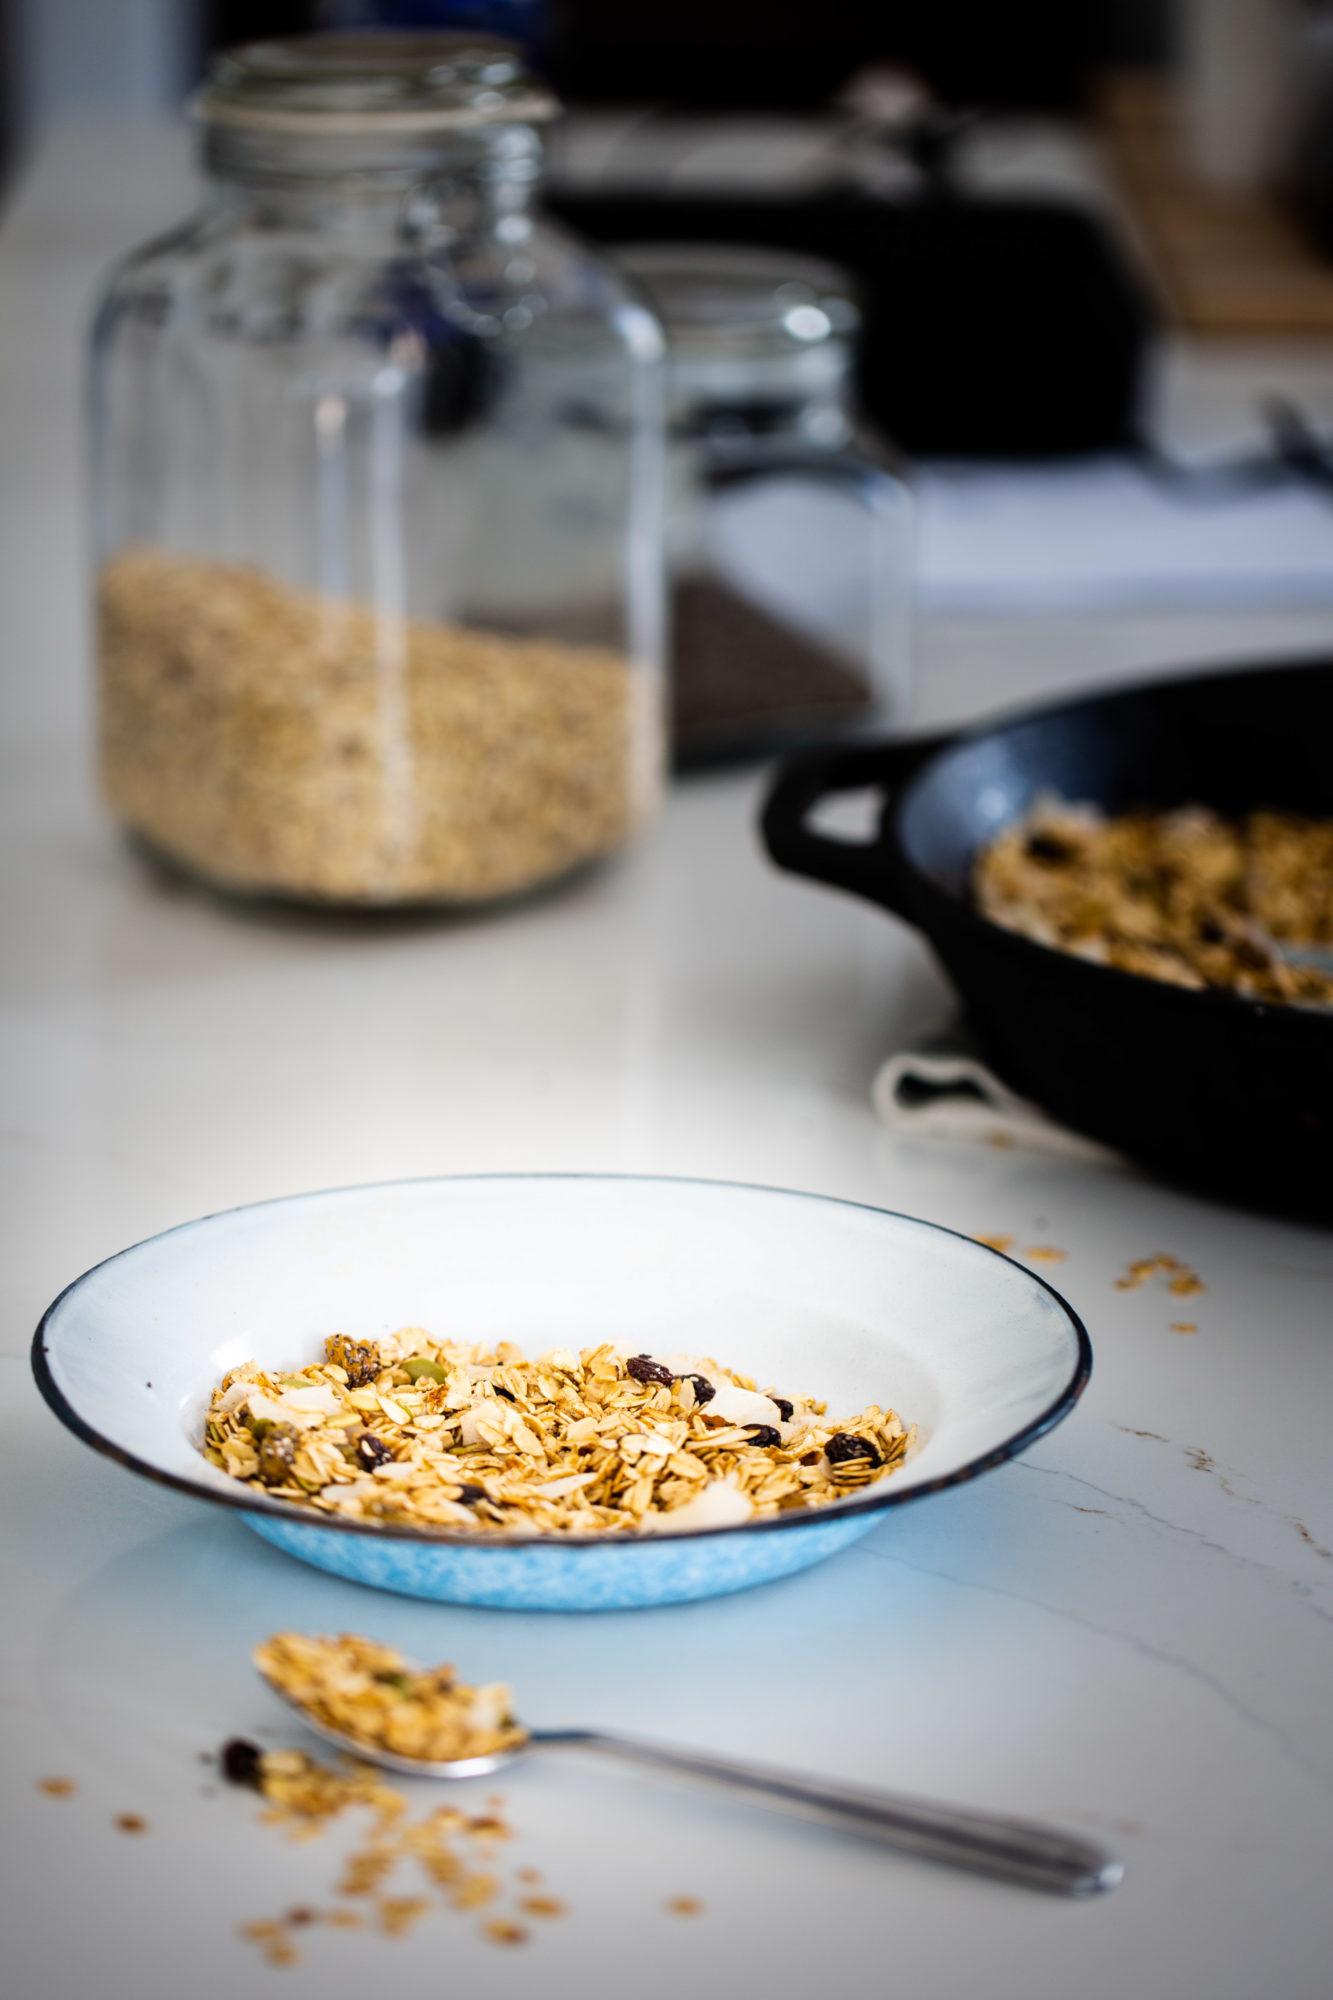 un plato  con granola hecha sobre la estufa